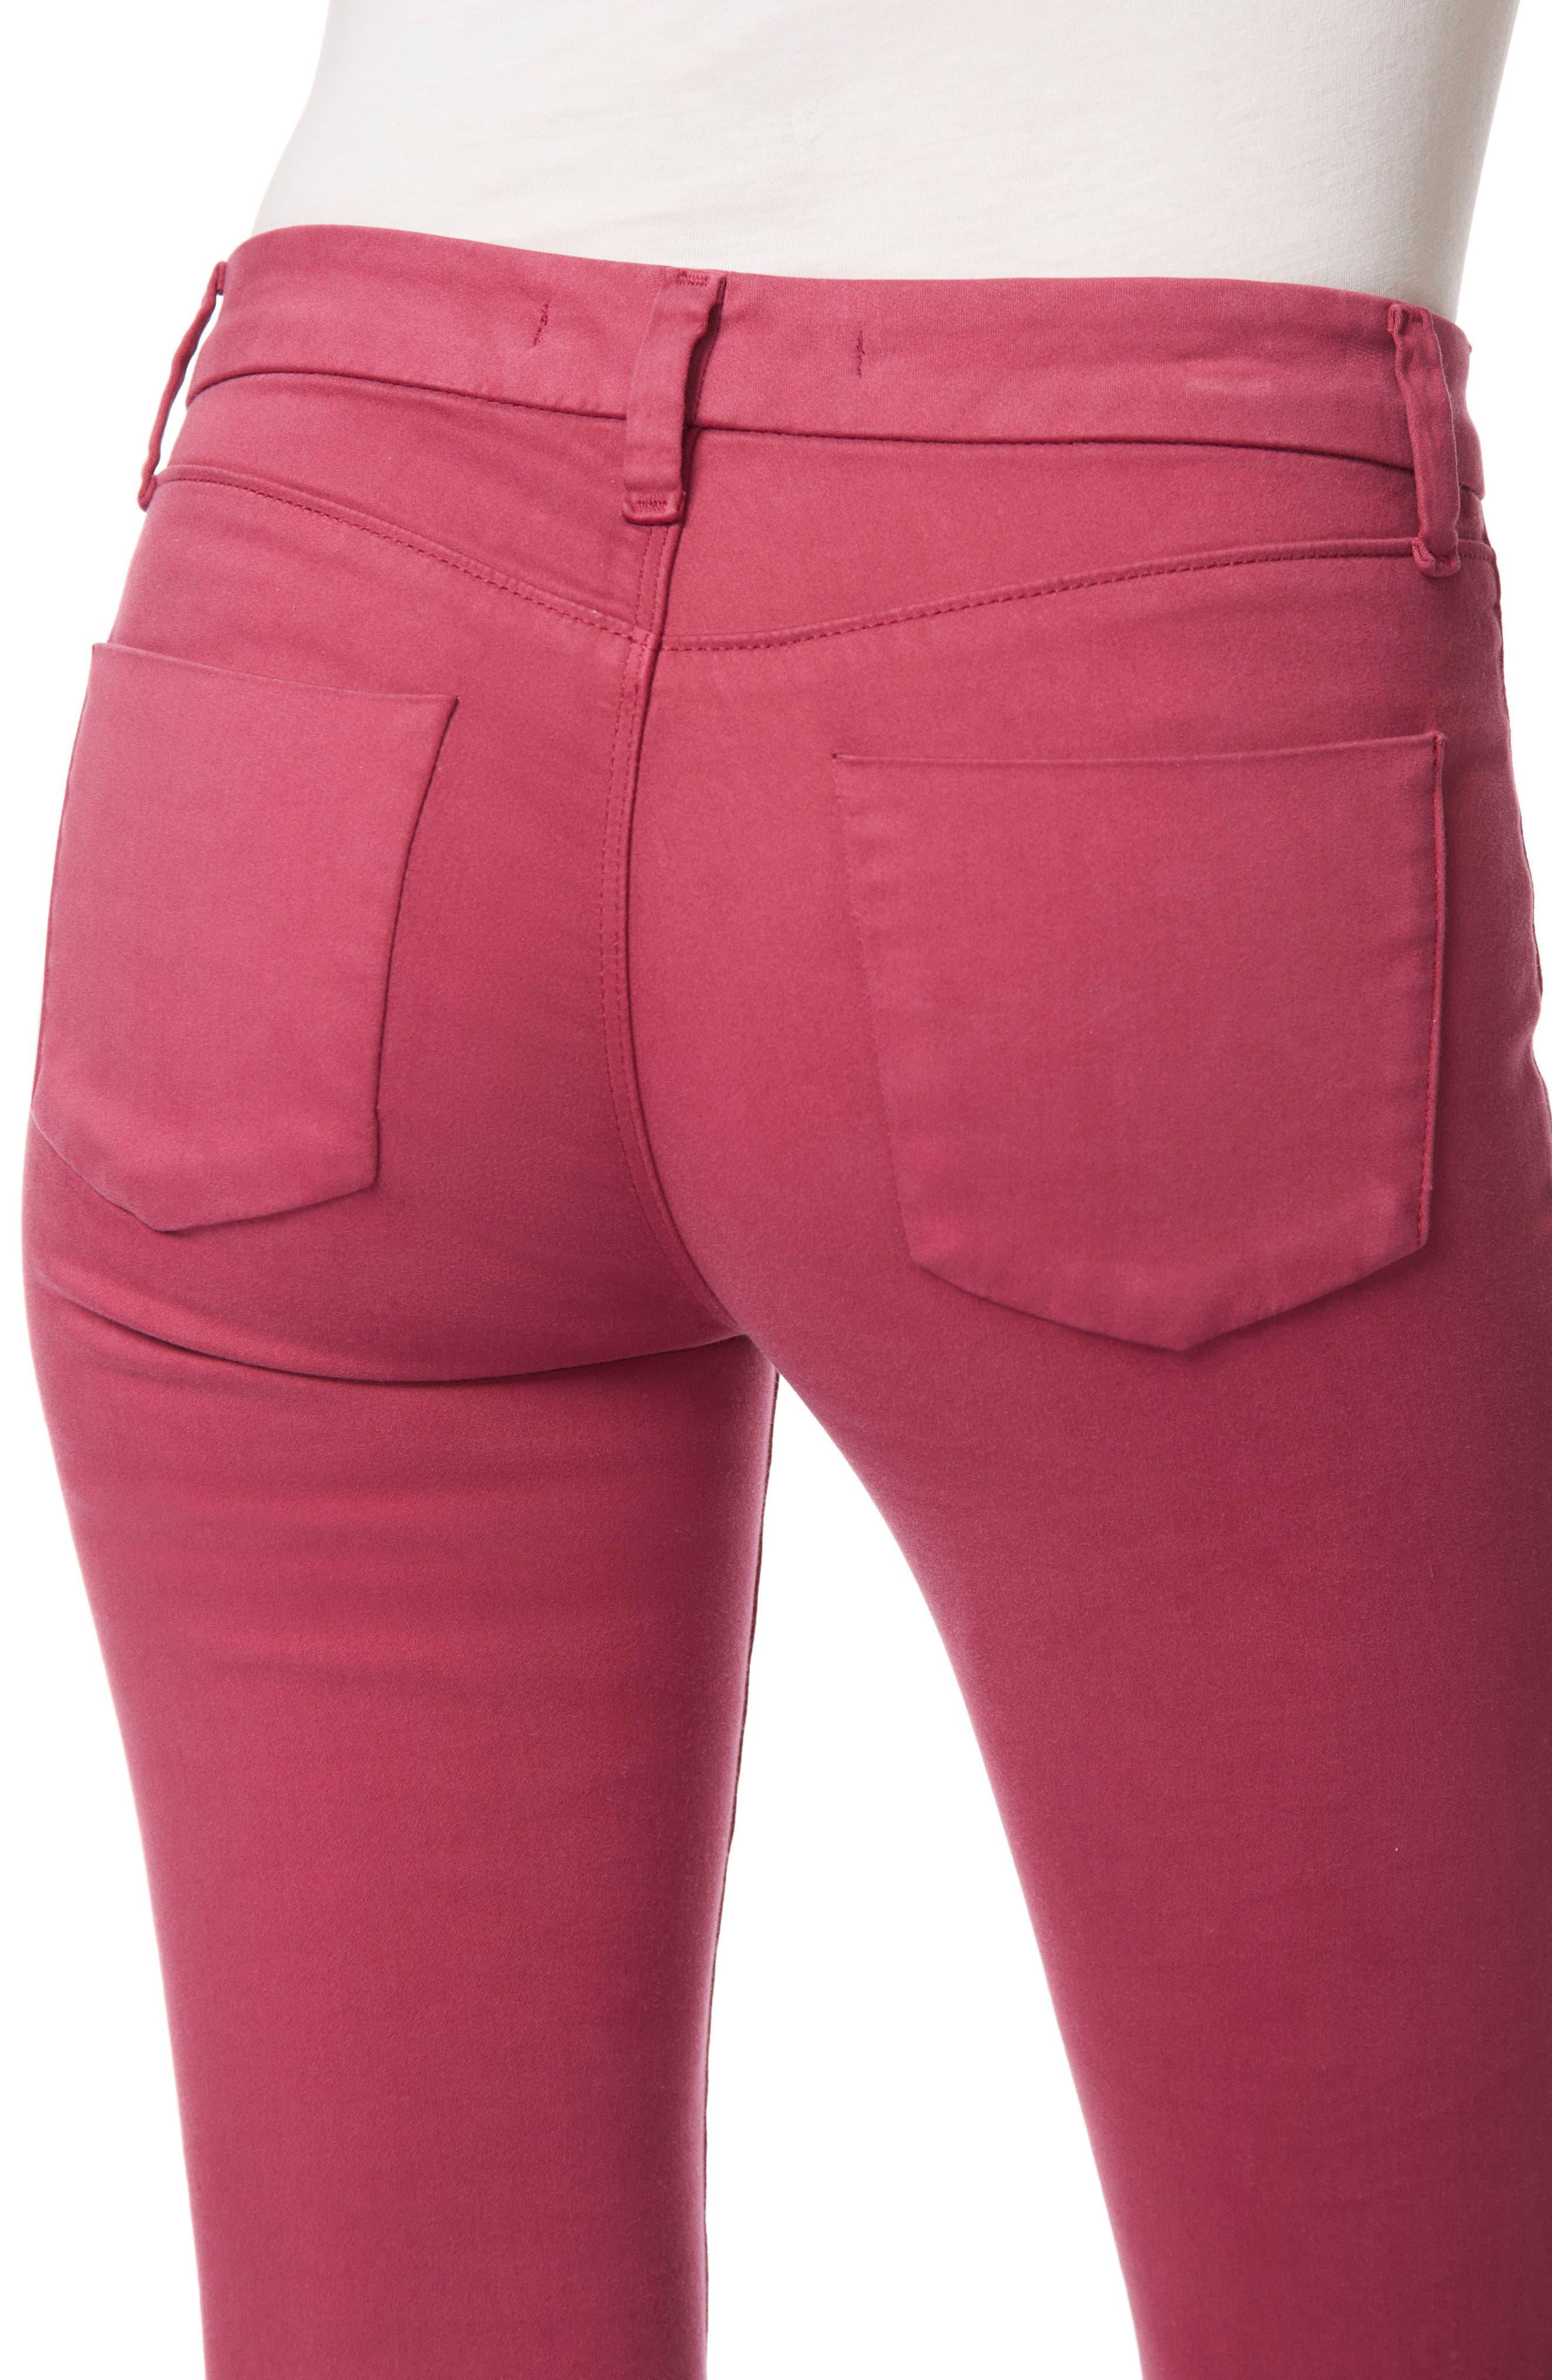 Anja Cuff Crop Jeans,                             Alternate thumbnail 5, color,                             Deep Plum